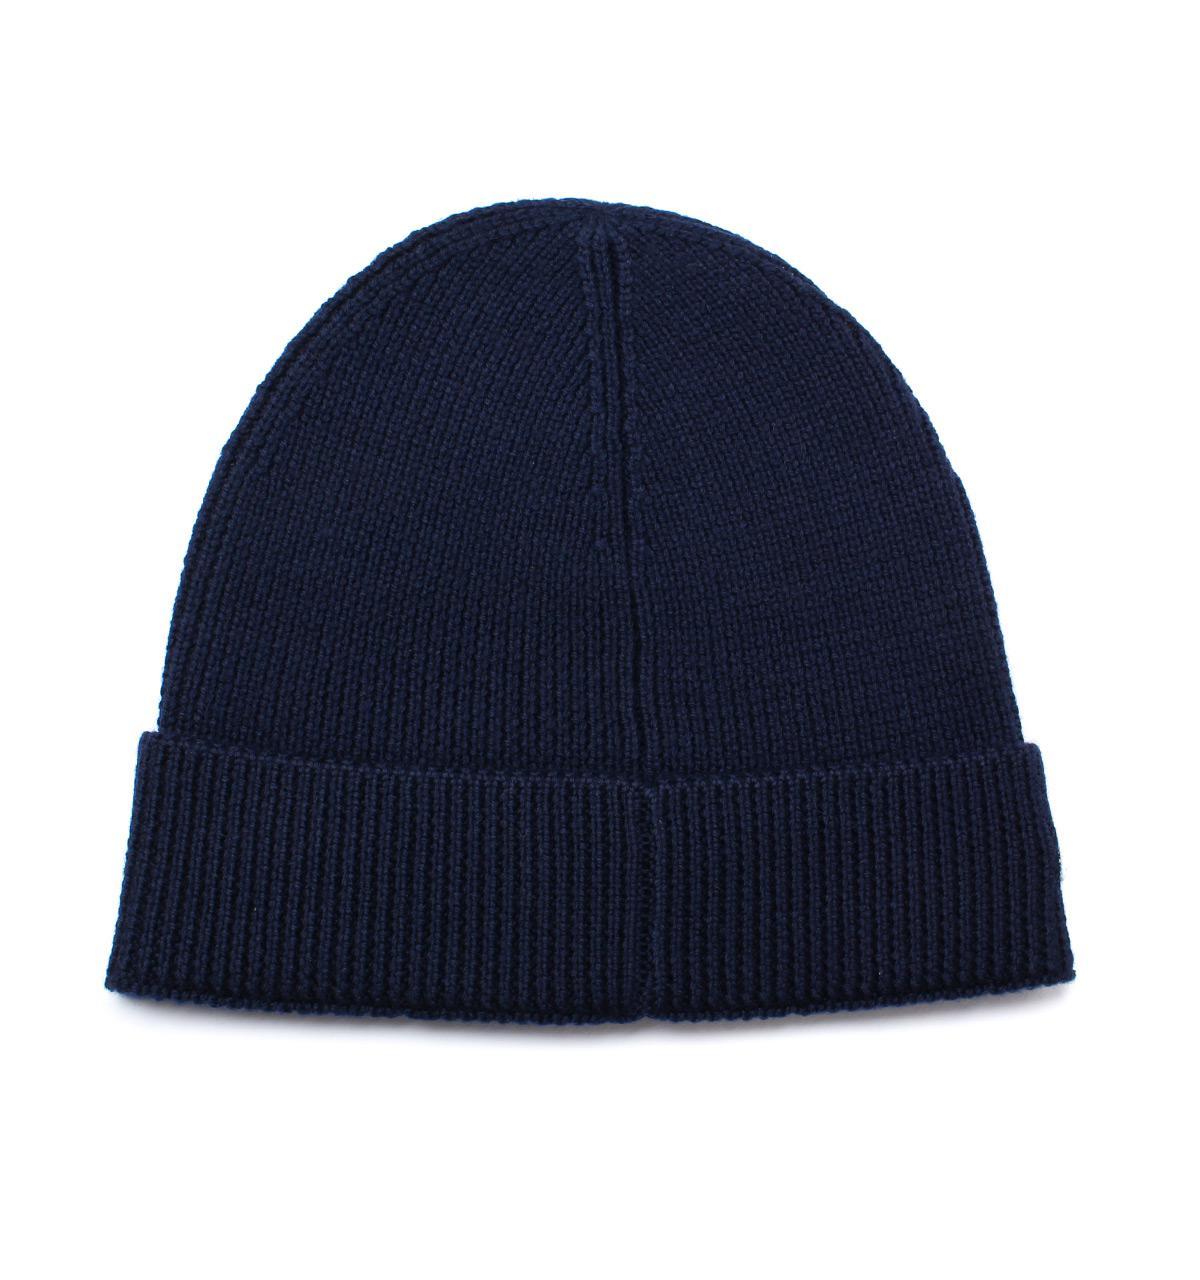 a2838aa98bd Lyst - Lacoste Marine Beanie Hat in Blue for Men